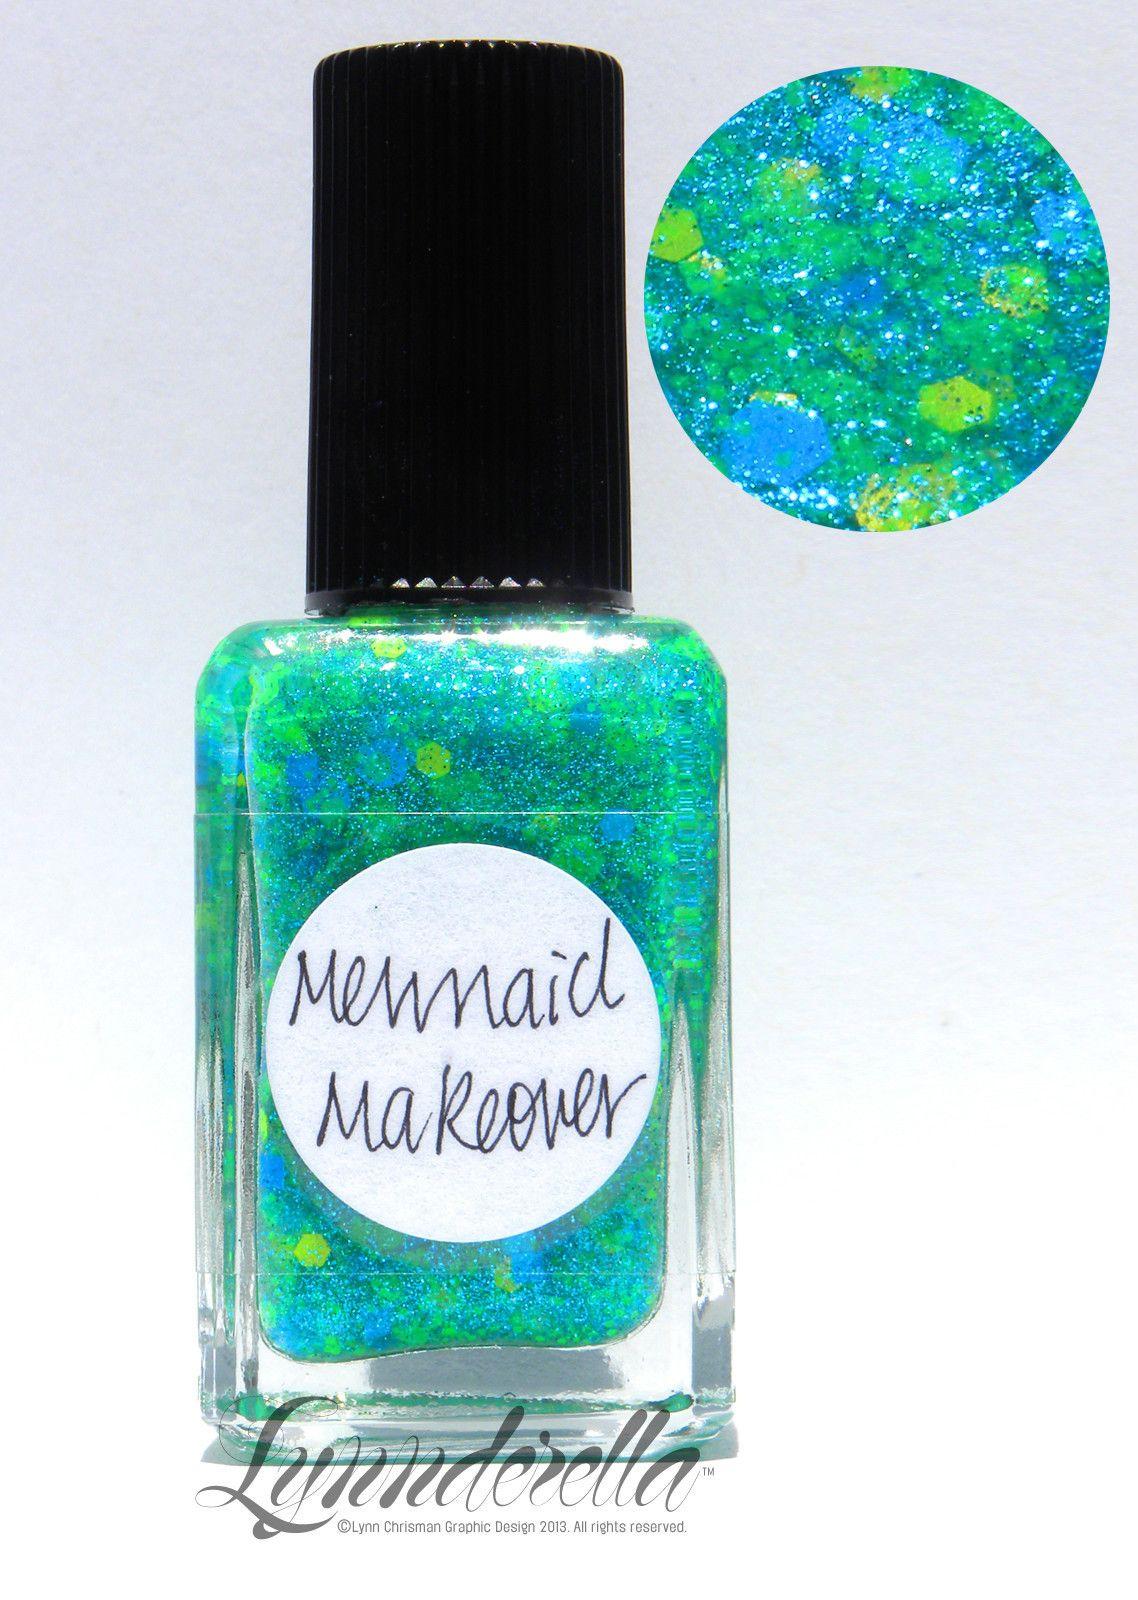 Lynnderella Limited Edition — Mermaid Makeover has assorted neon ...